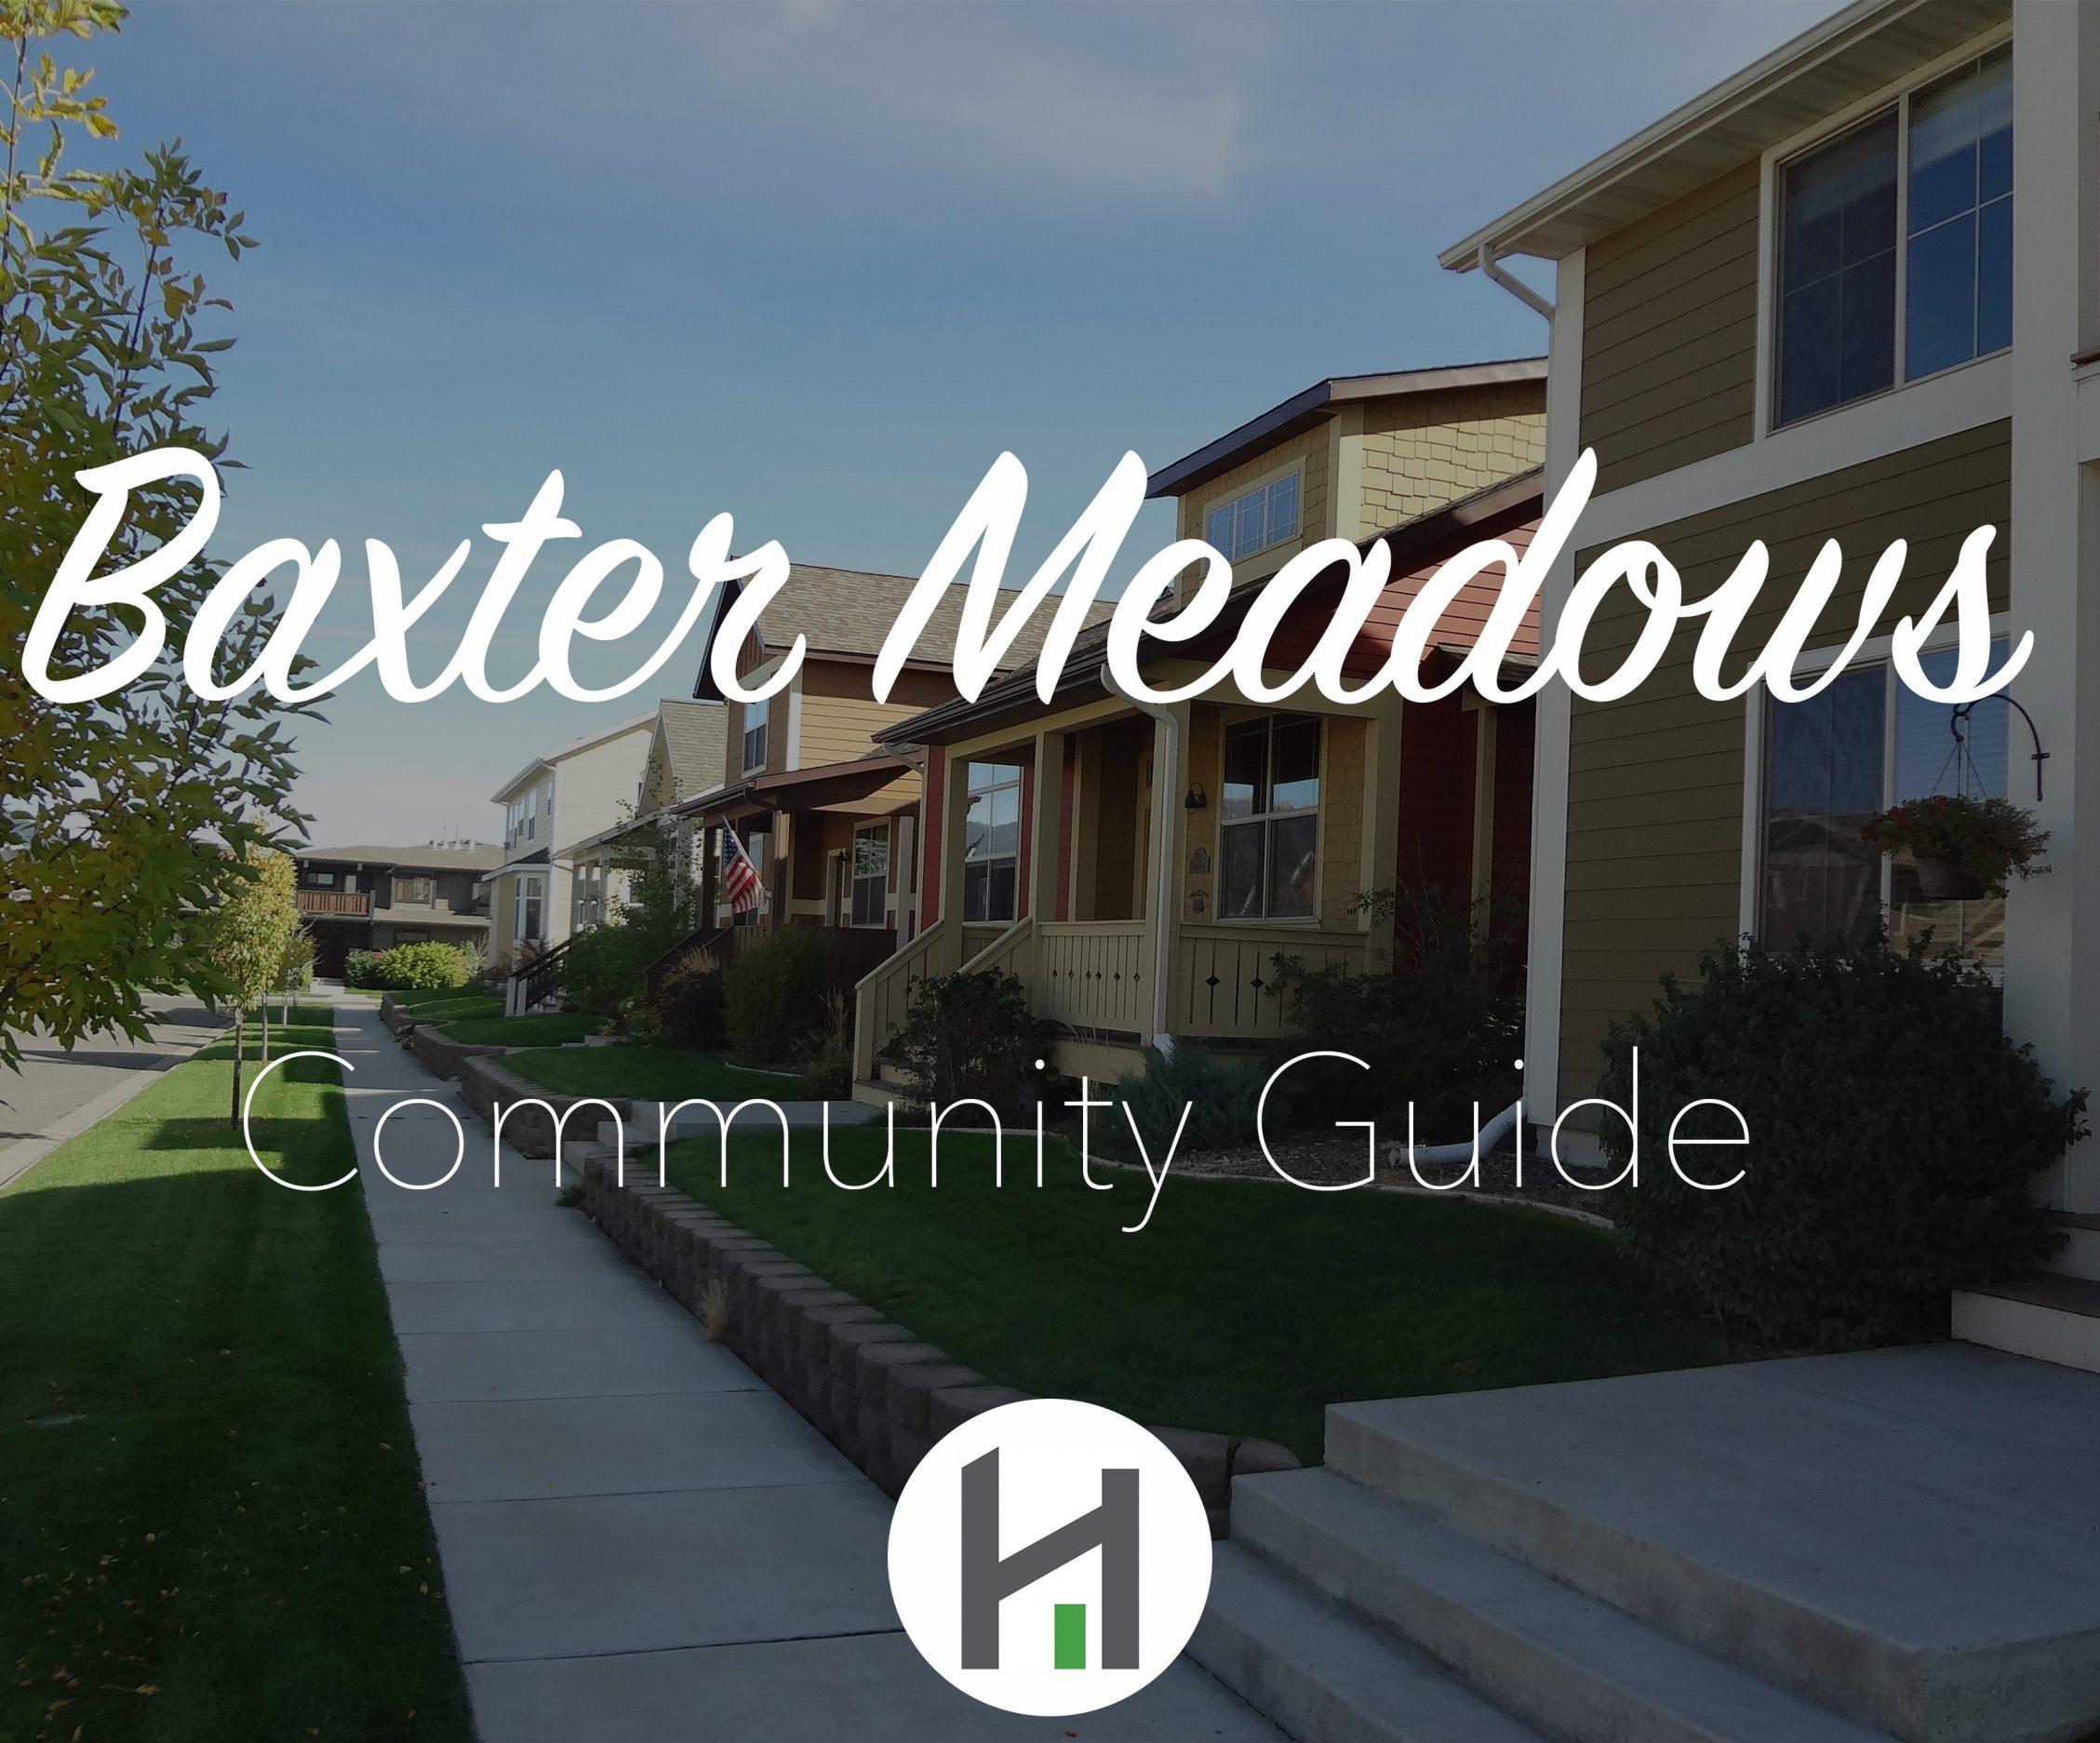 Discover Baxter Meadows Real Estate in Bozeman Montana